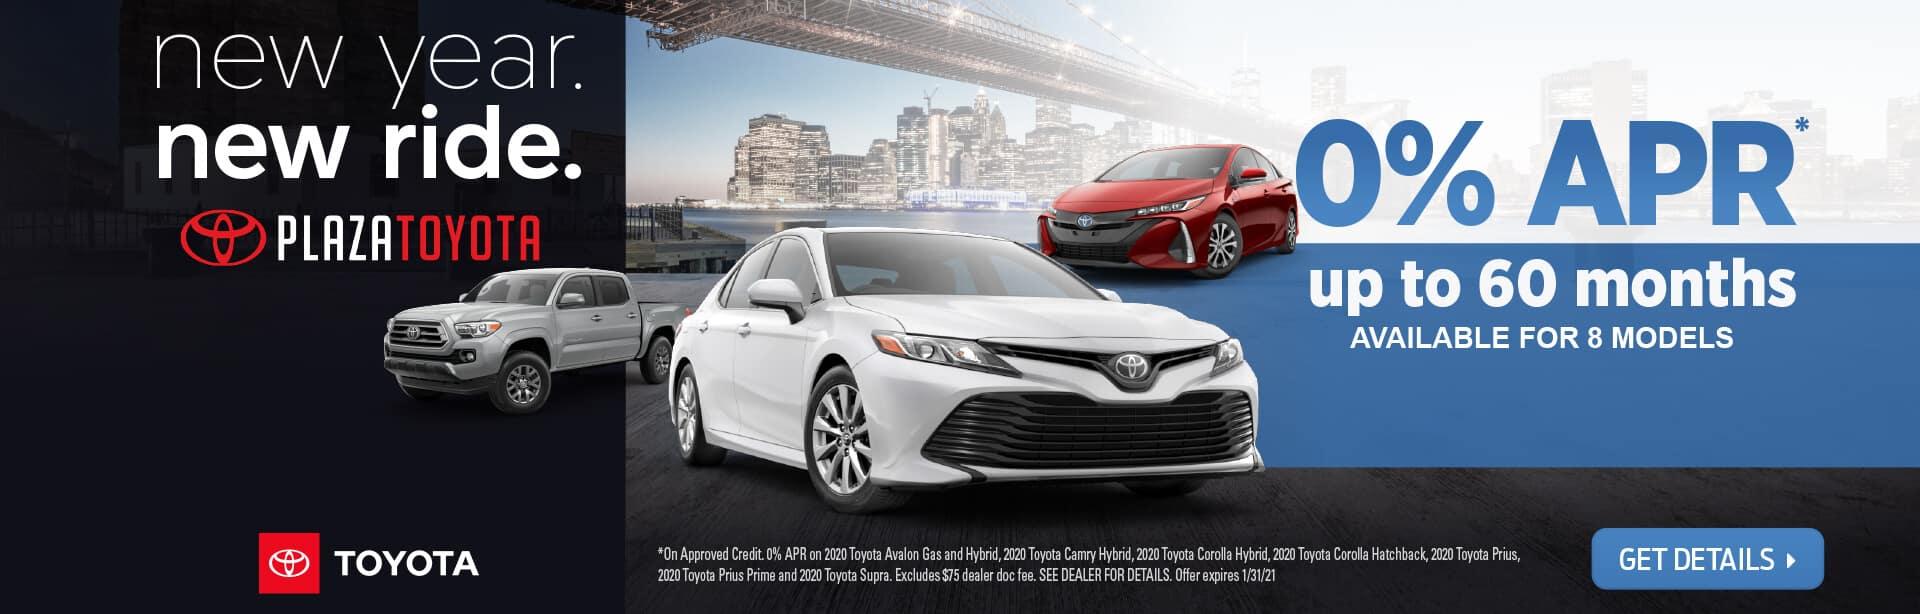 2020.12.28-Plaza-Toyota-JAN-Web-Banners-1-S50183vw-1